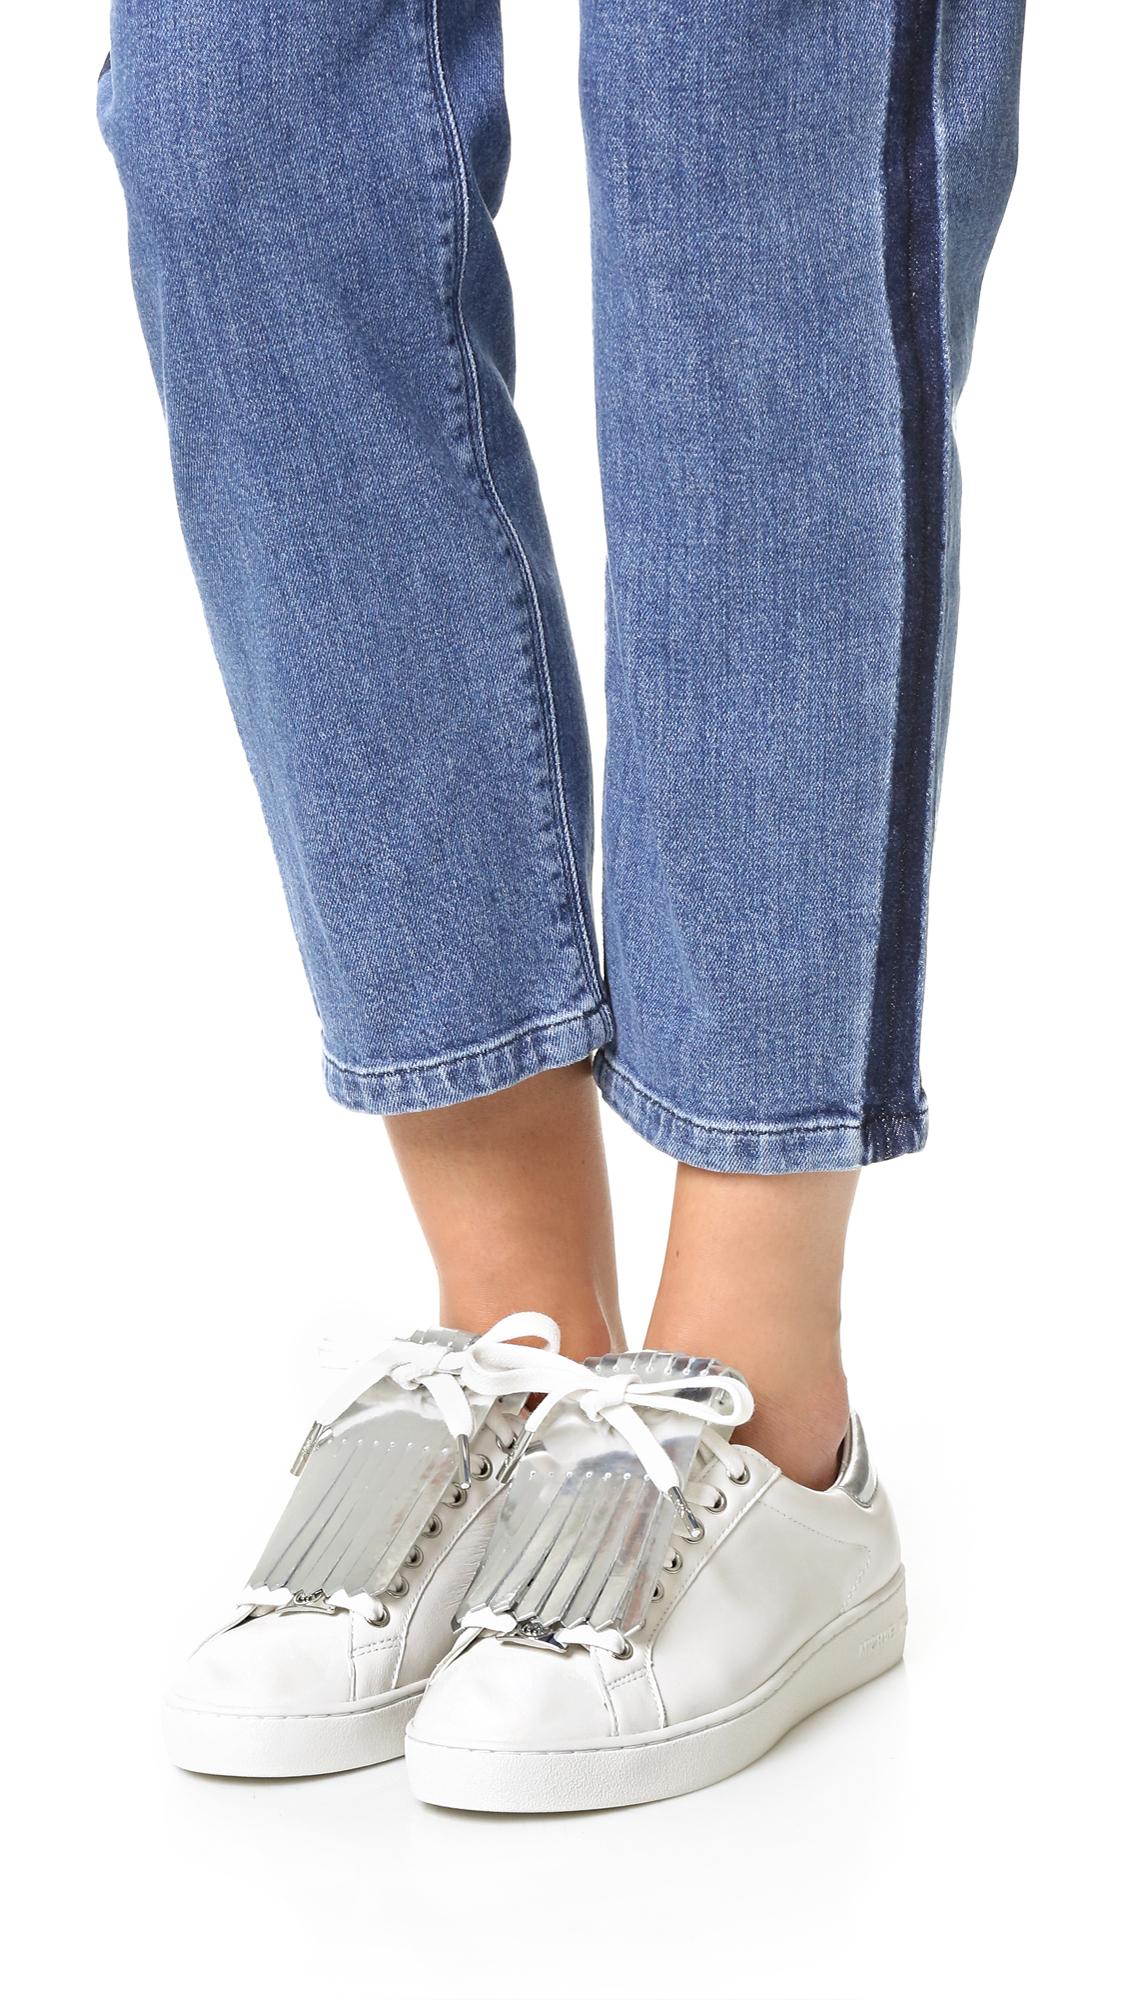 12fc385ff46 MICHAEL Michael Kors Keaton Kiltie Sneakers